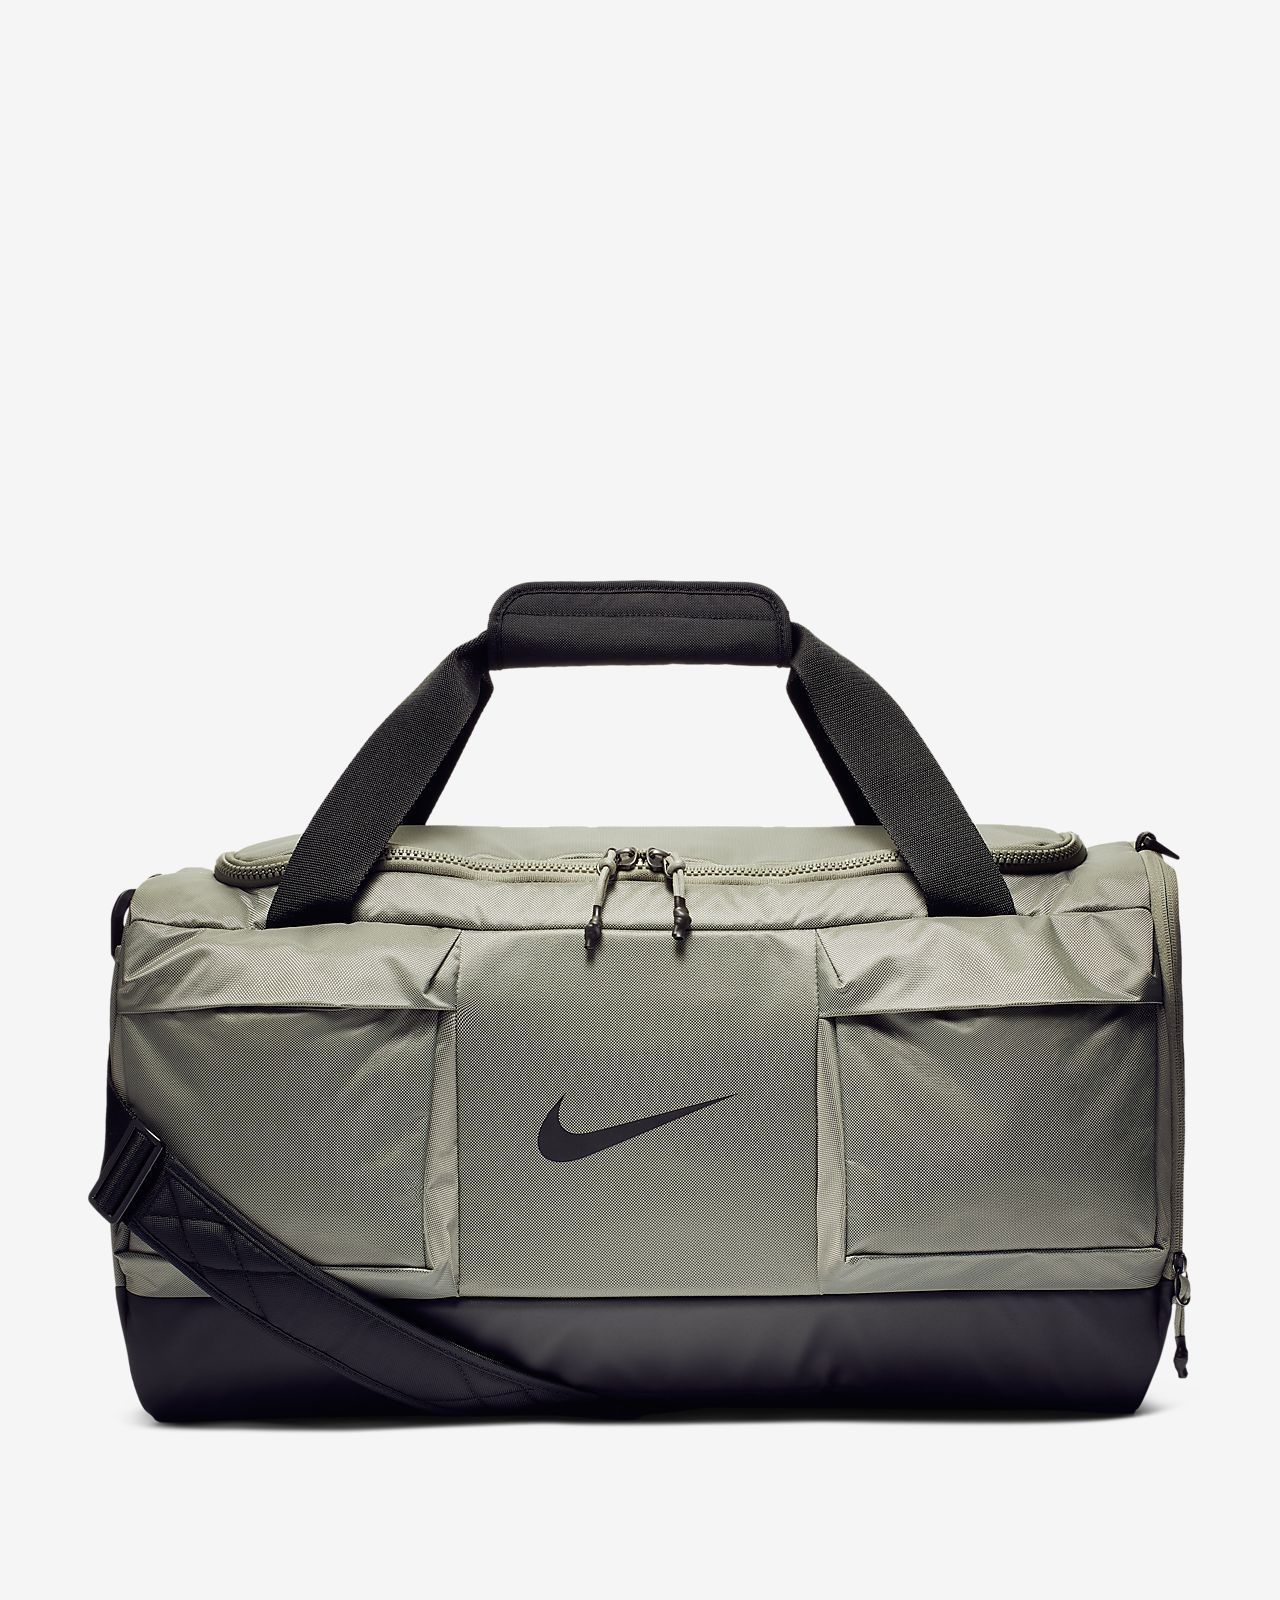 3219293eeb Nike Vapor Power Men s Training Duffel Bag (Medium). Nike.com LU